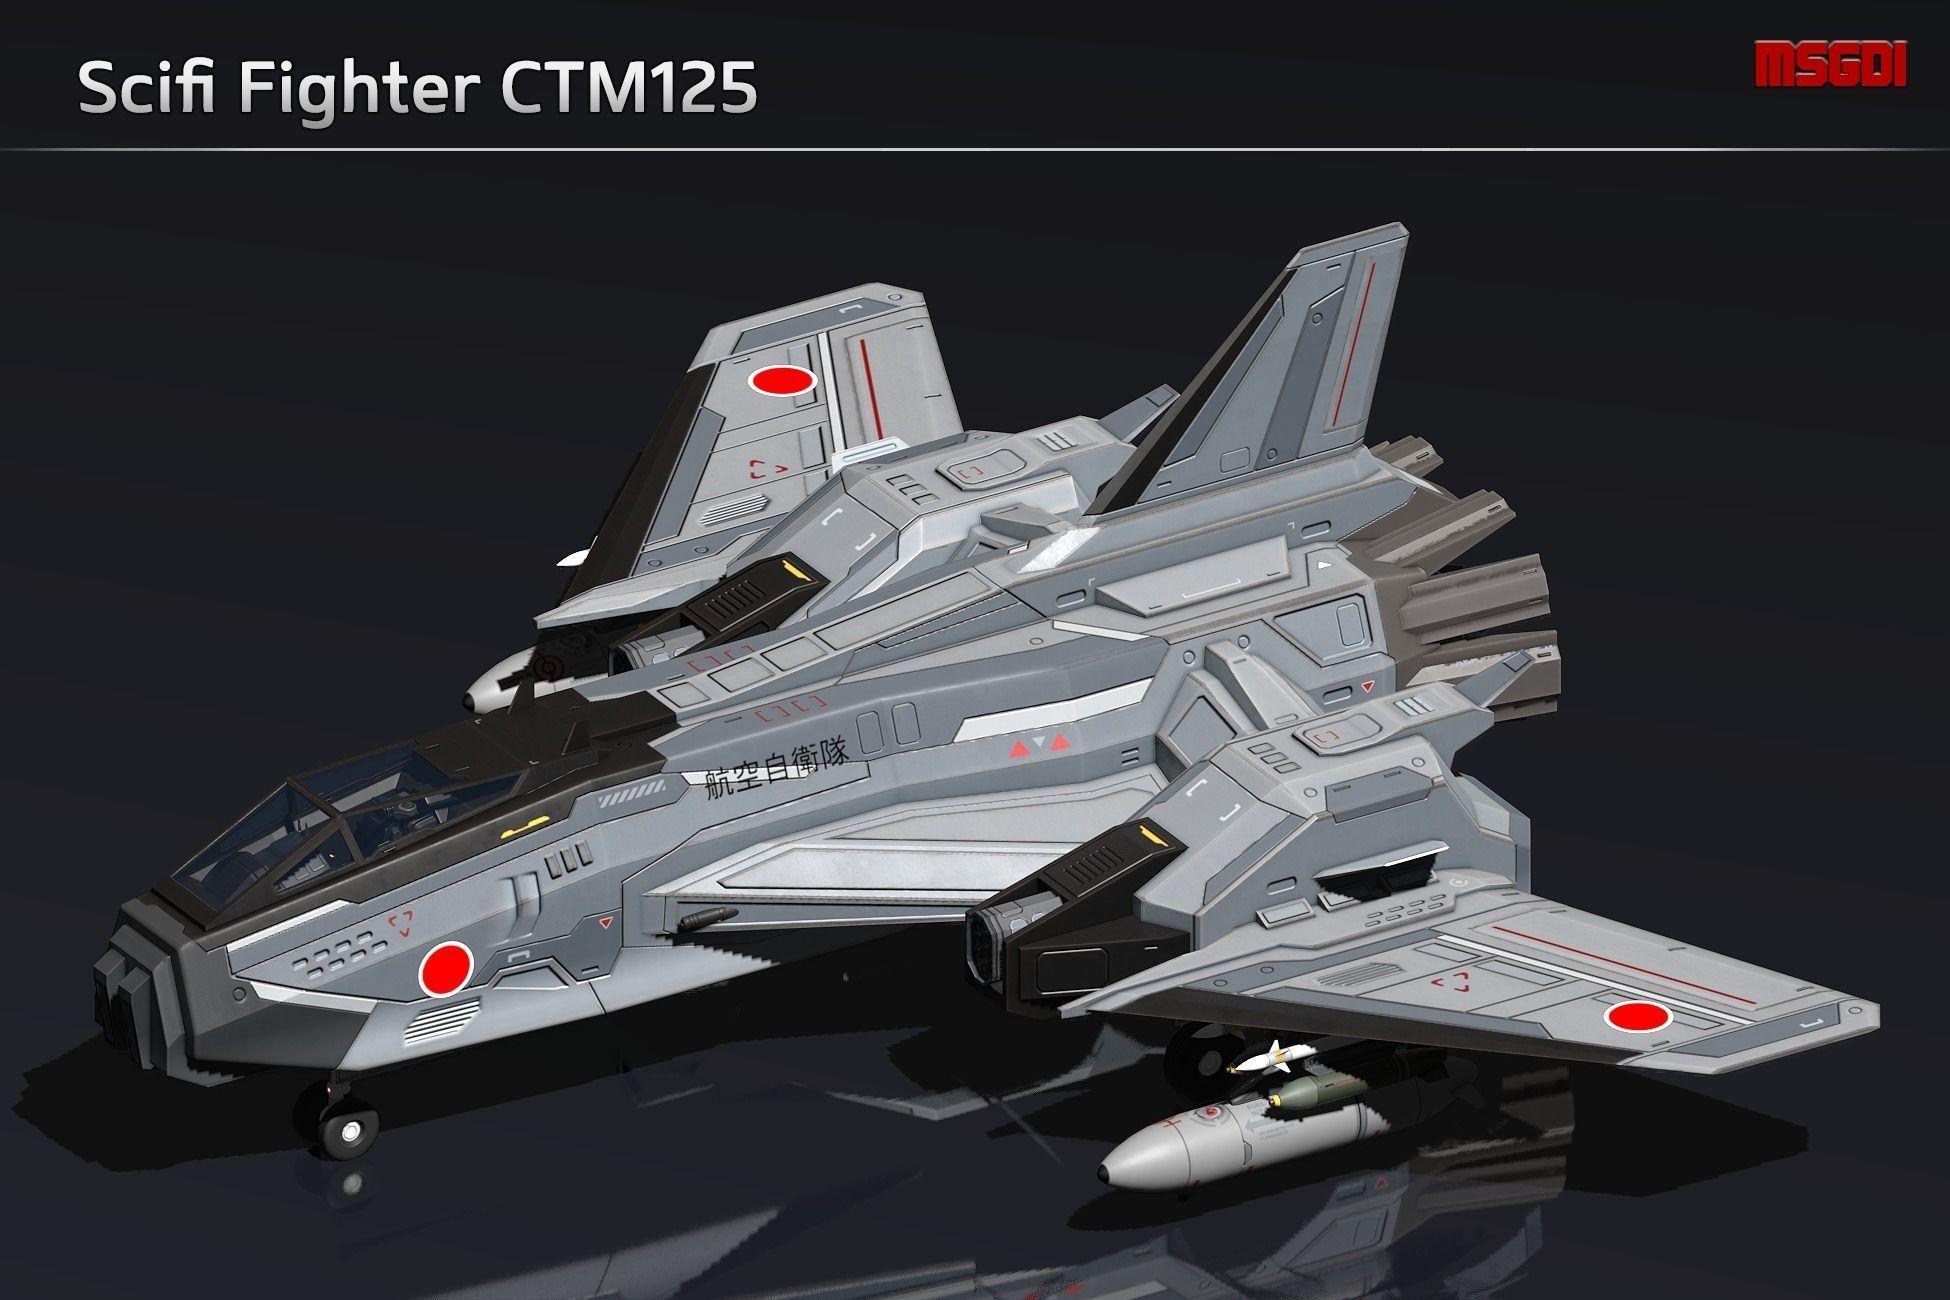 Scifi Fighter CTM125